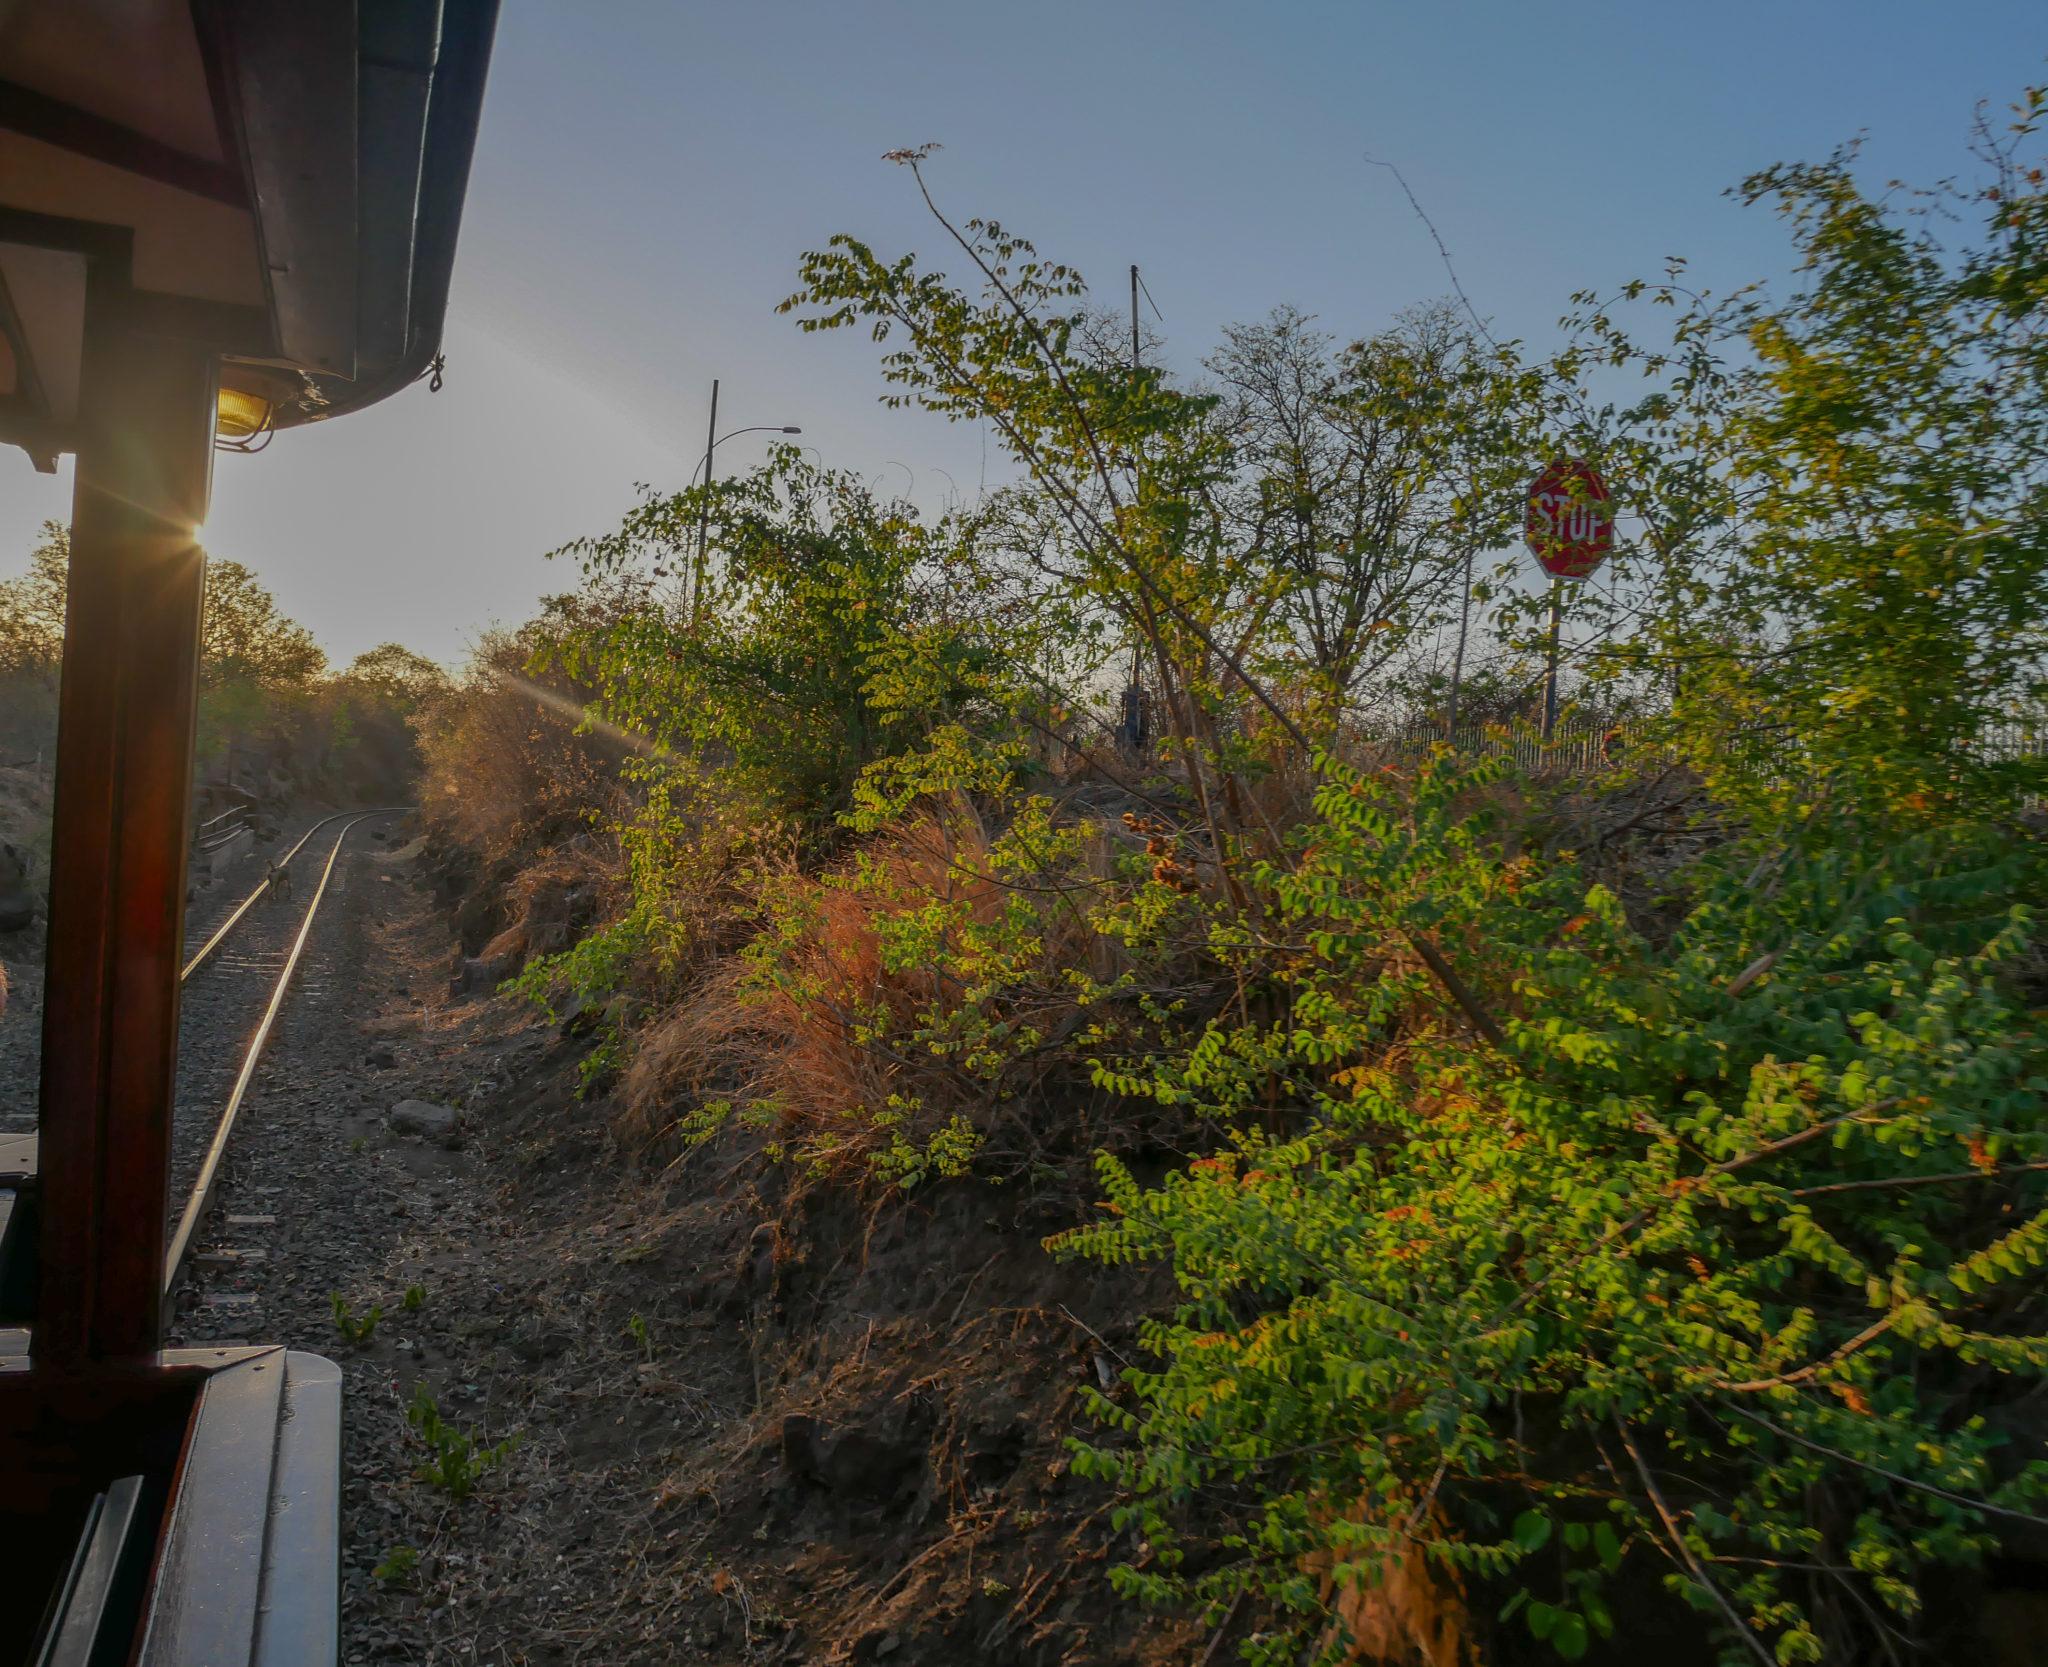 The dry bush alongside the tracks of the Royal Livingstone Express train